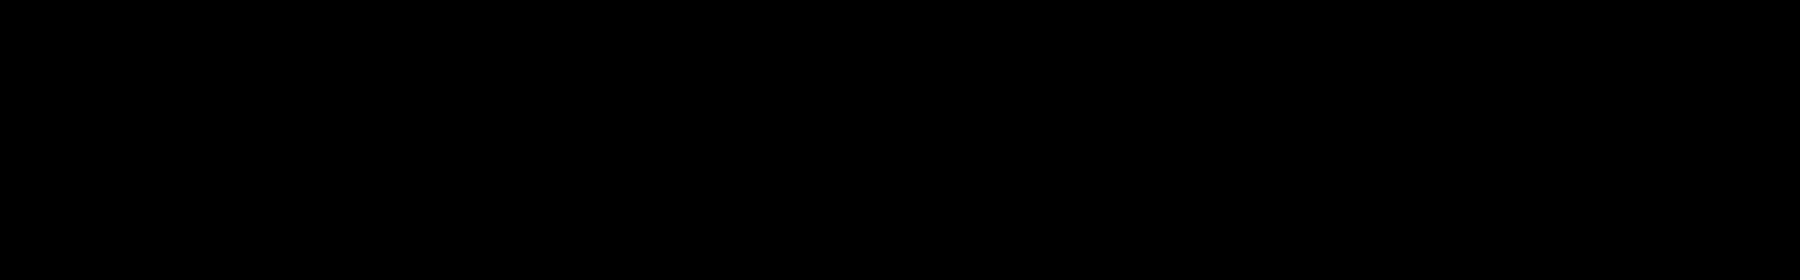 Daft Tones audio waveform